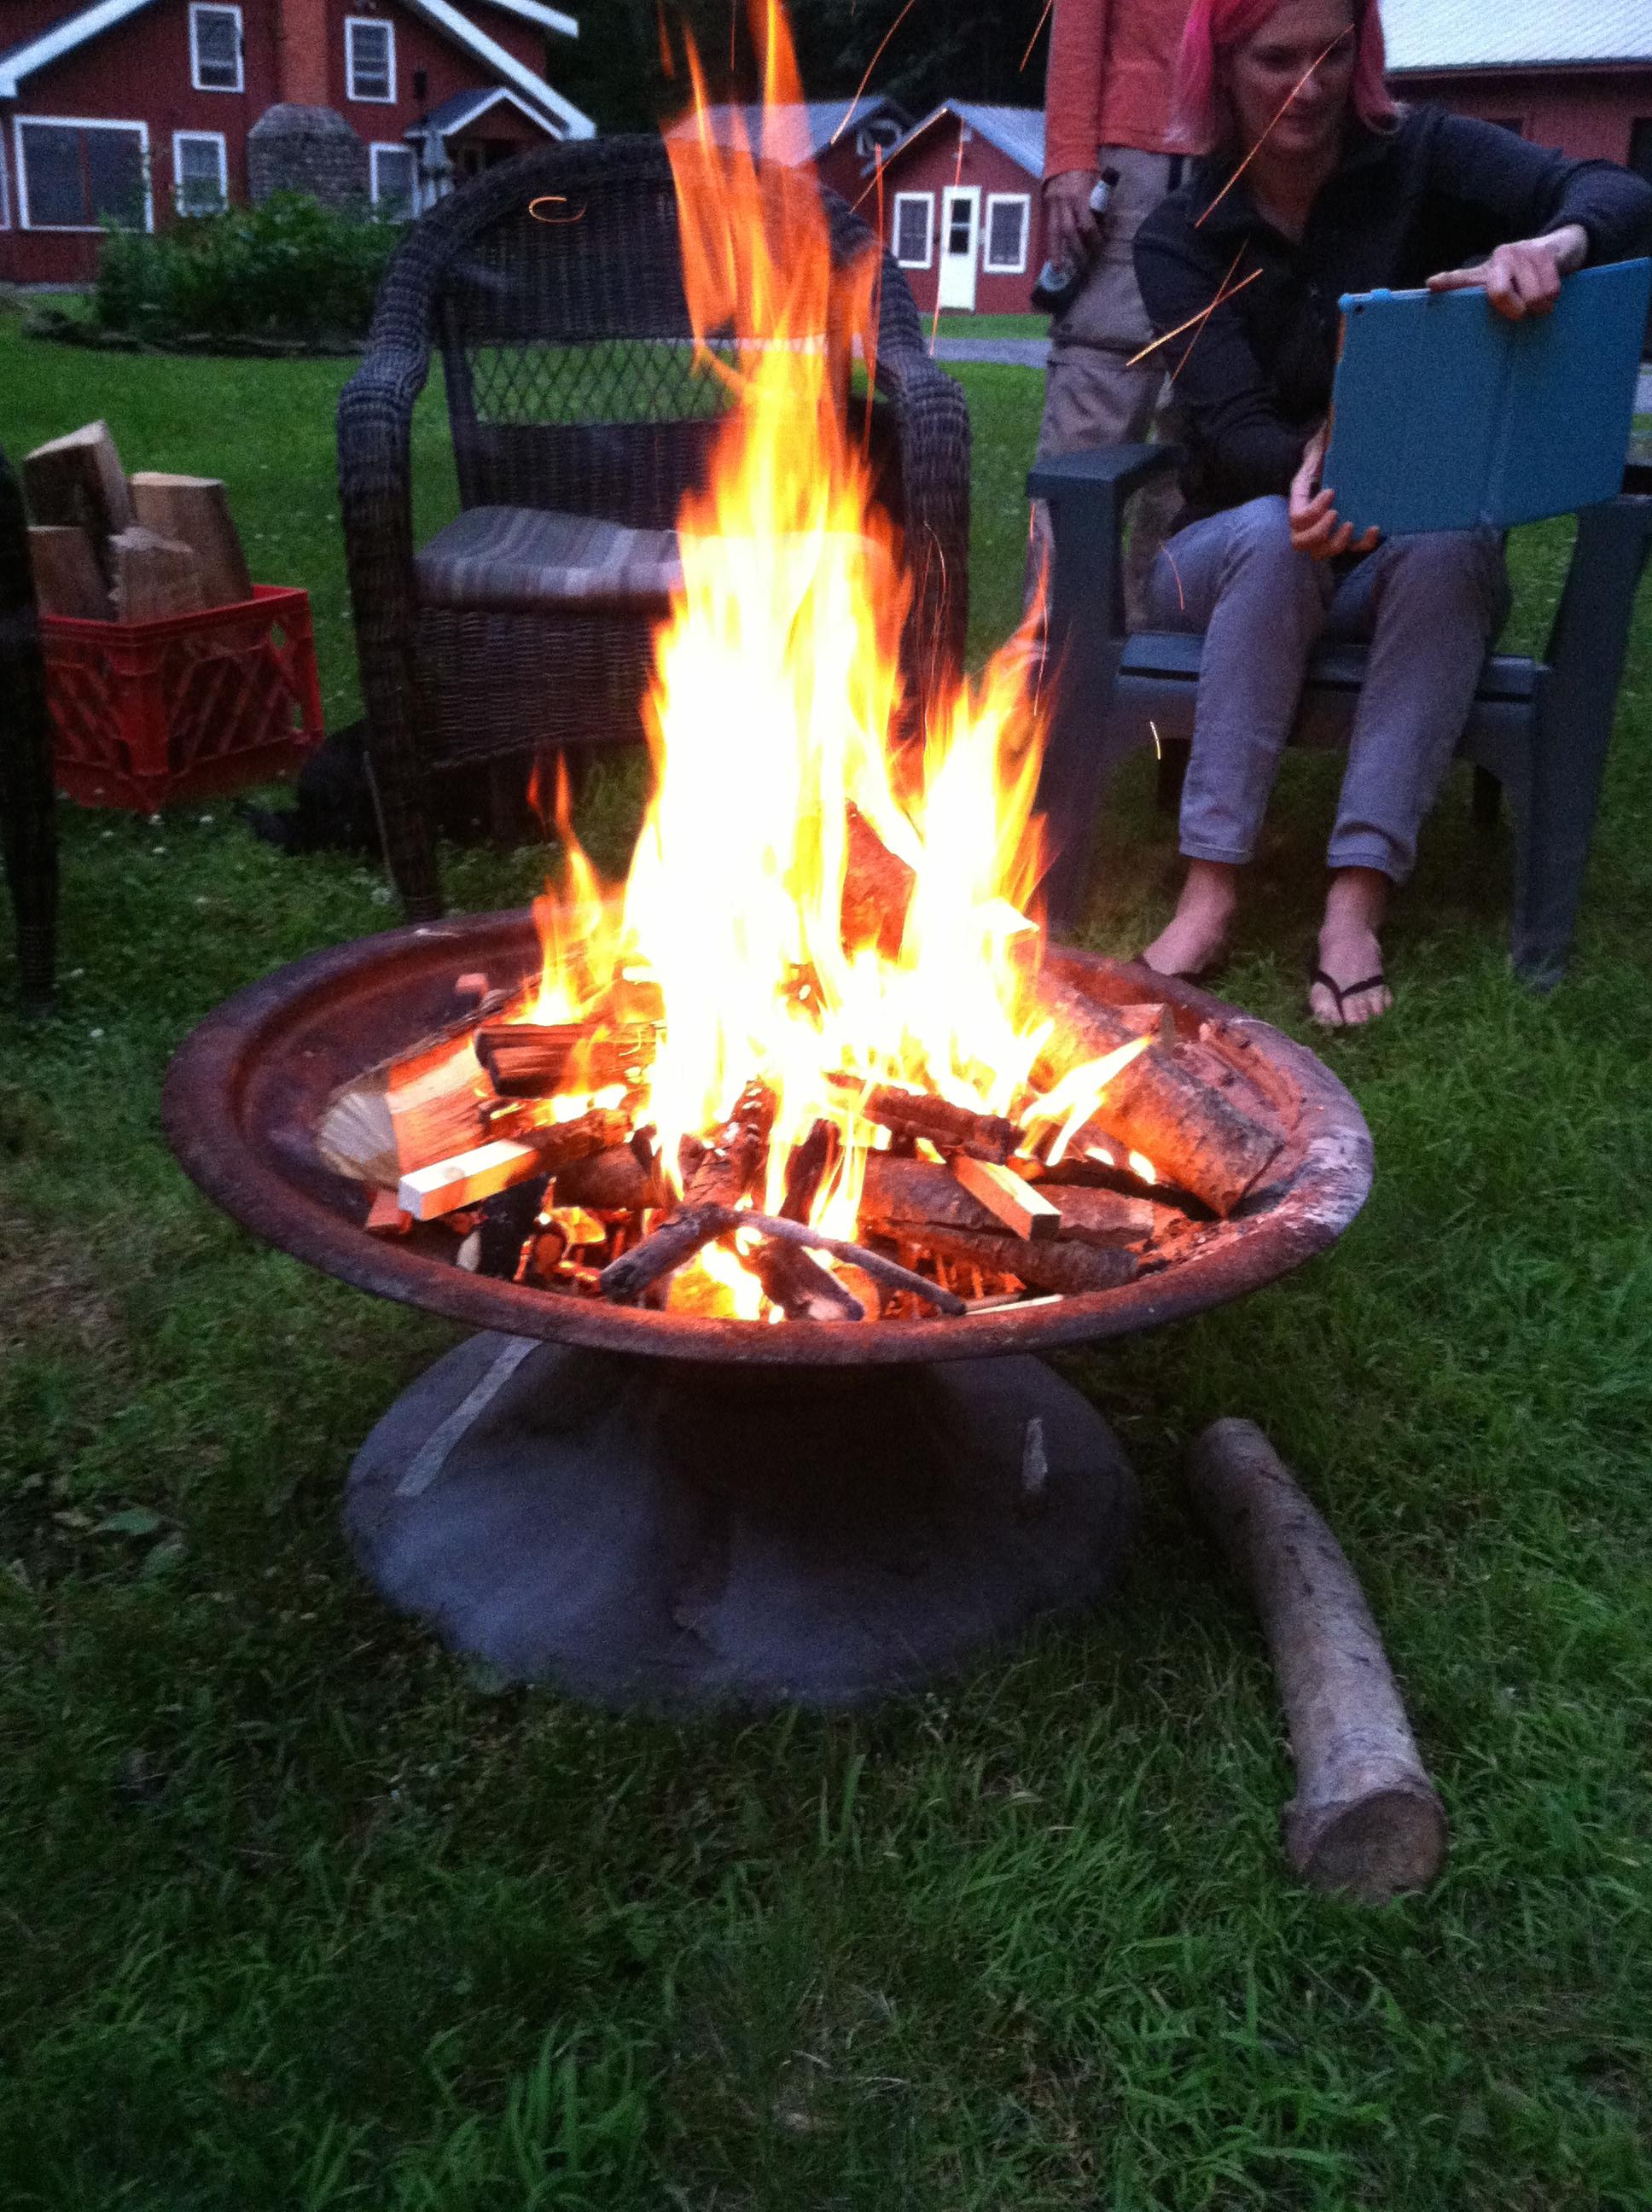 Campfires & fun at Wellnesste Lodge.